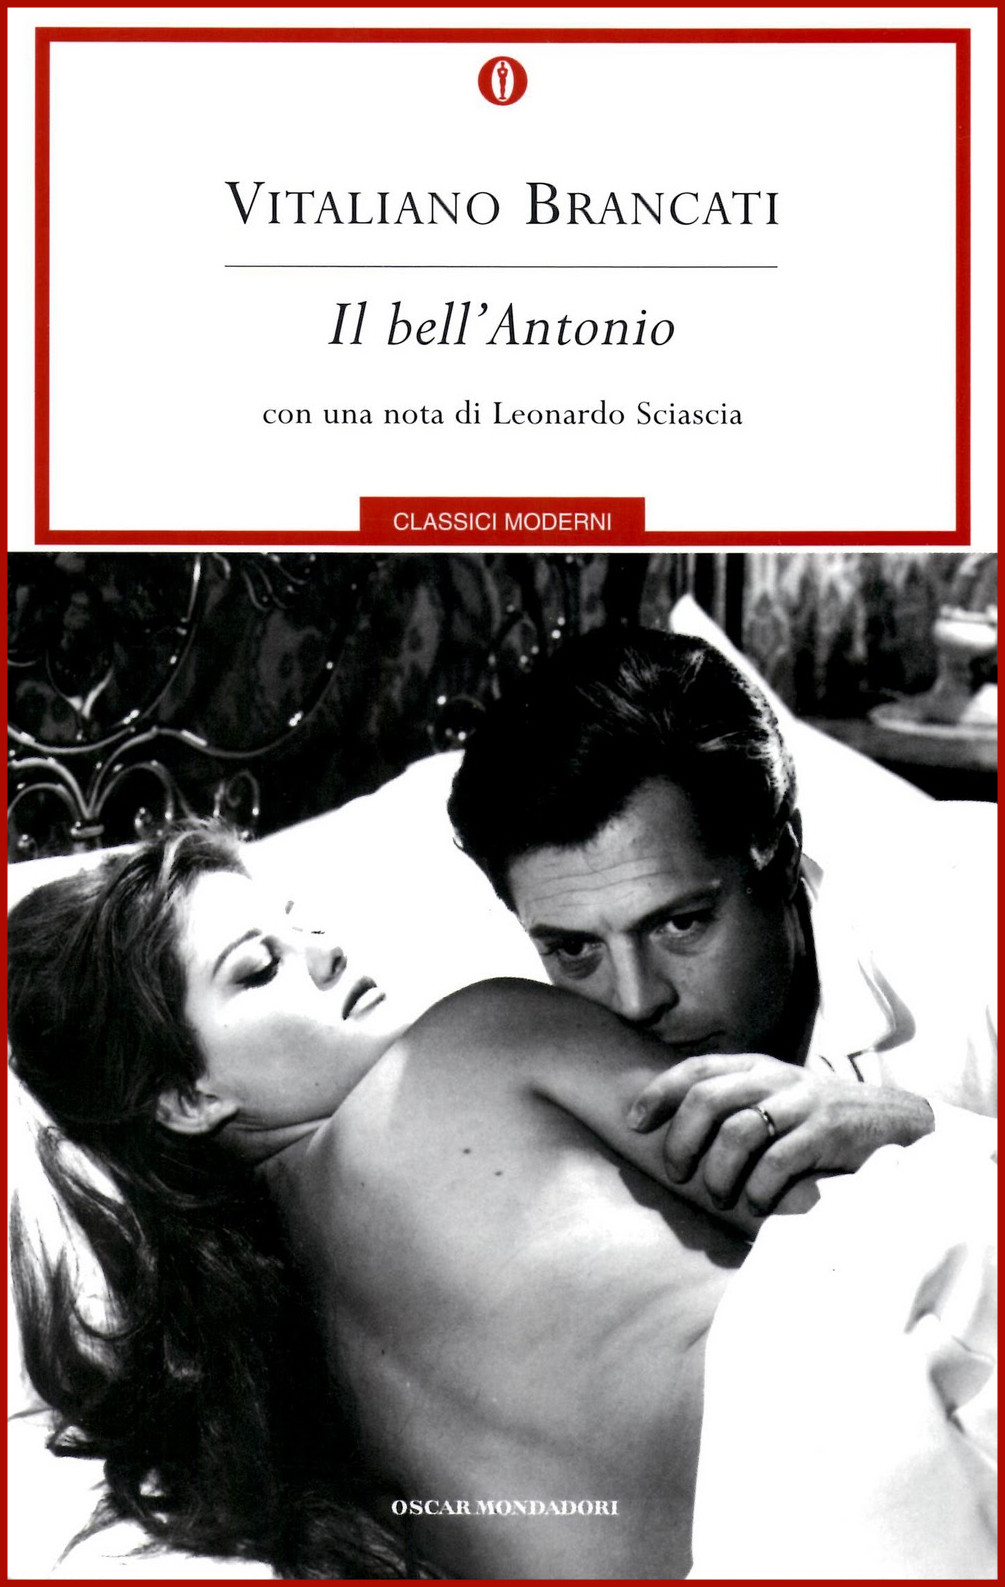 Il bell'Antonio